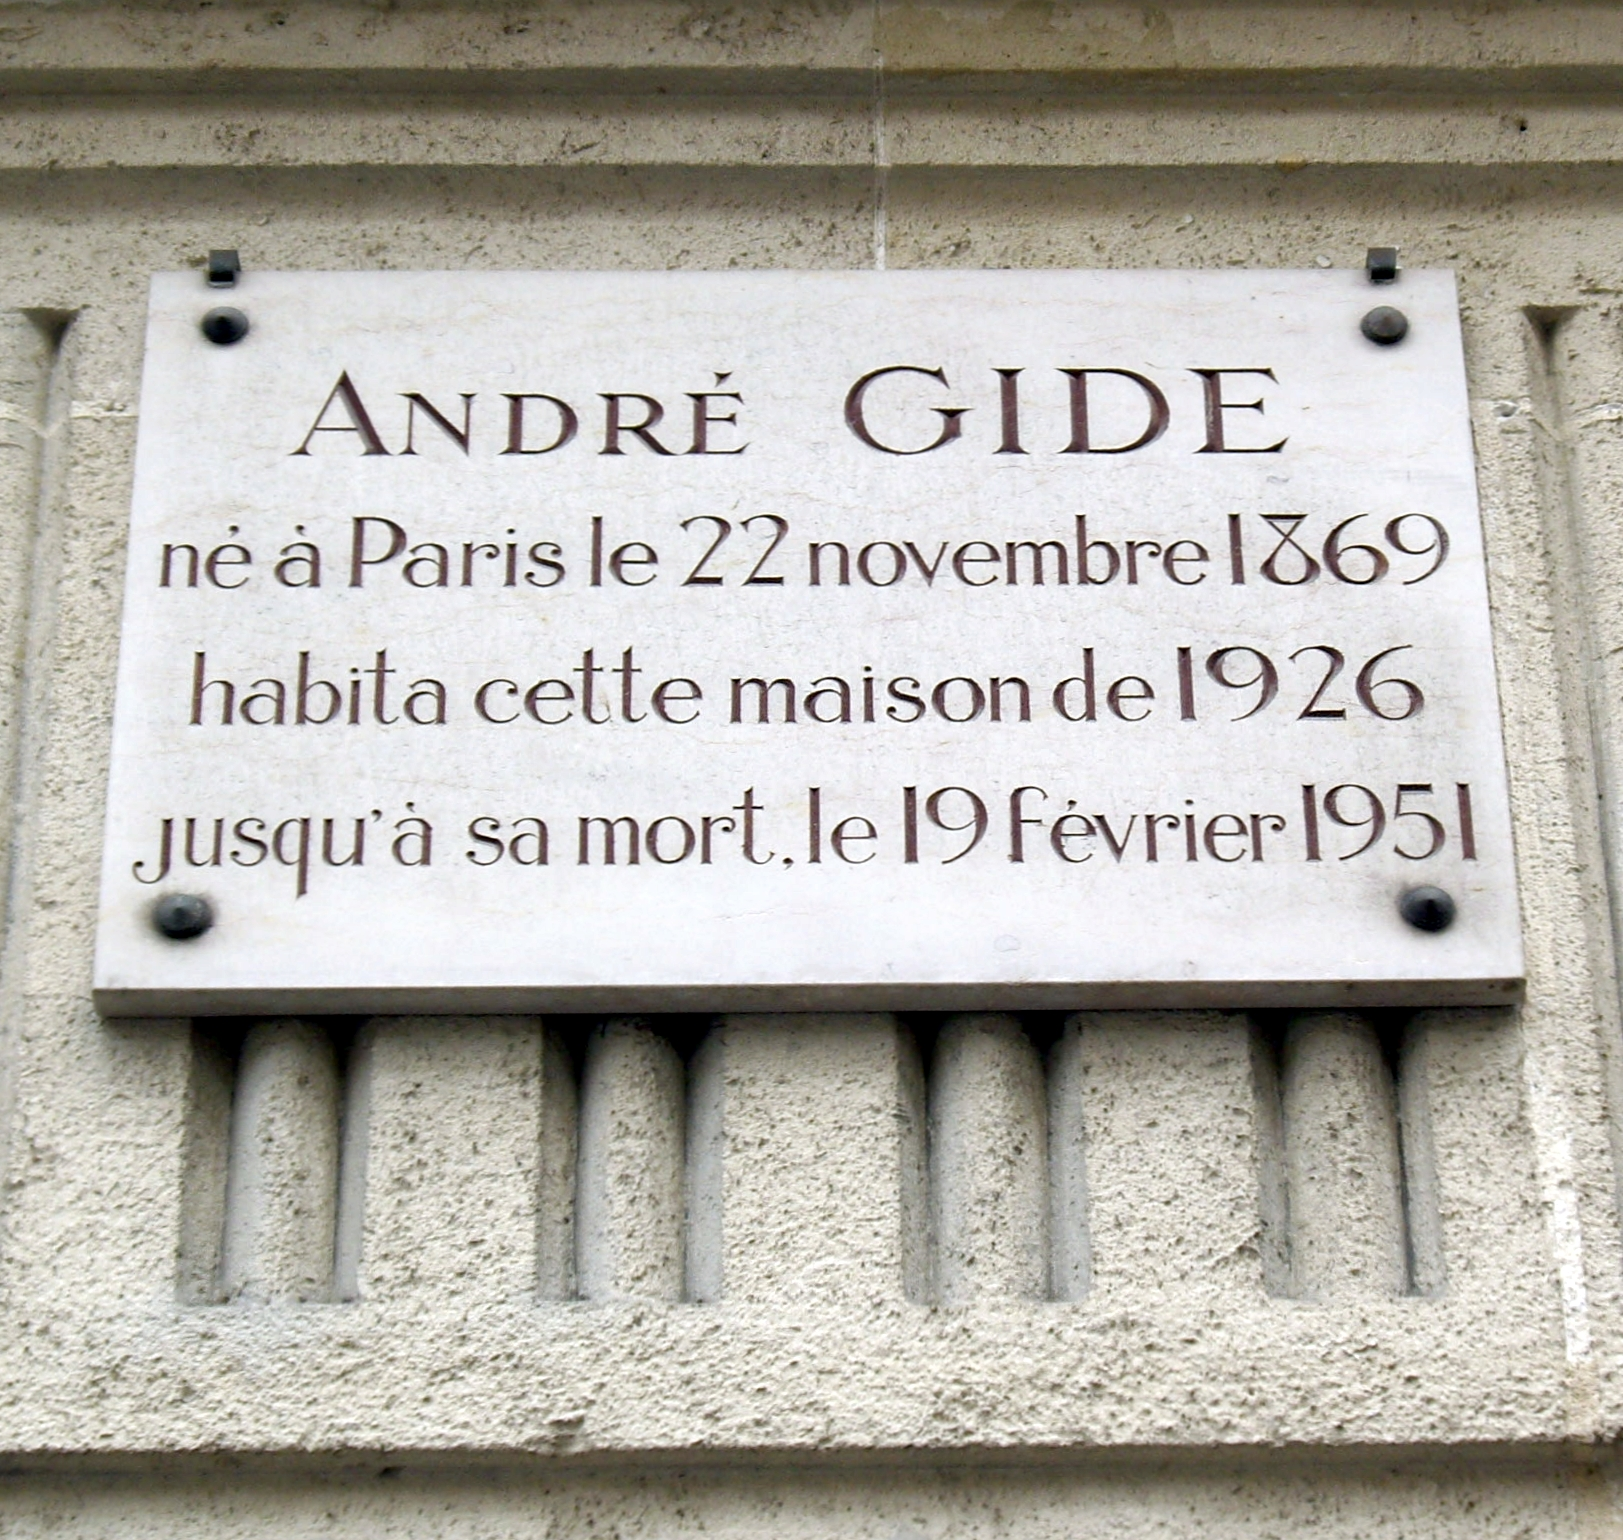 http://upload.wikimedia.org/wikipedia/commons/9/9d/Plaque_André_Gide,_1_bis_rue_Vaneau,_Paris_7.jpg